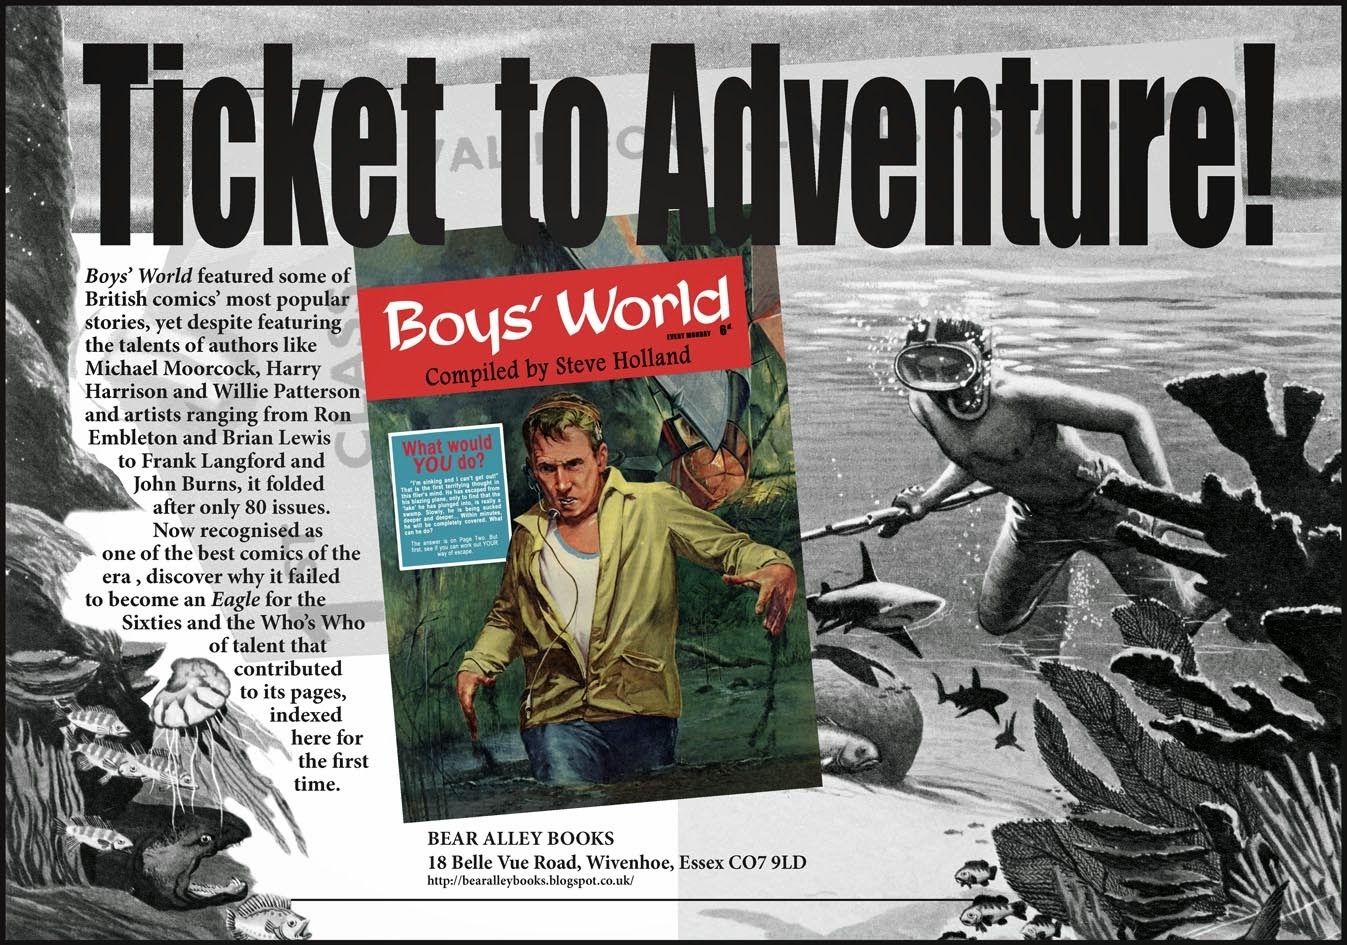 http://bearalleybooks.blogspot.co.uk/2013/08/boys-world-ticket-to-adventure.html